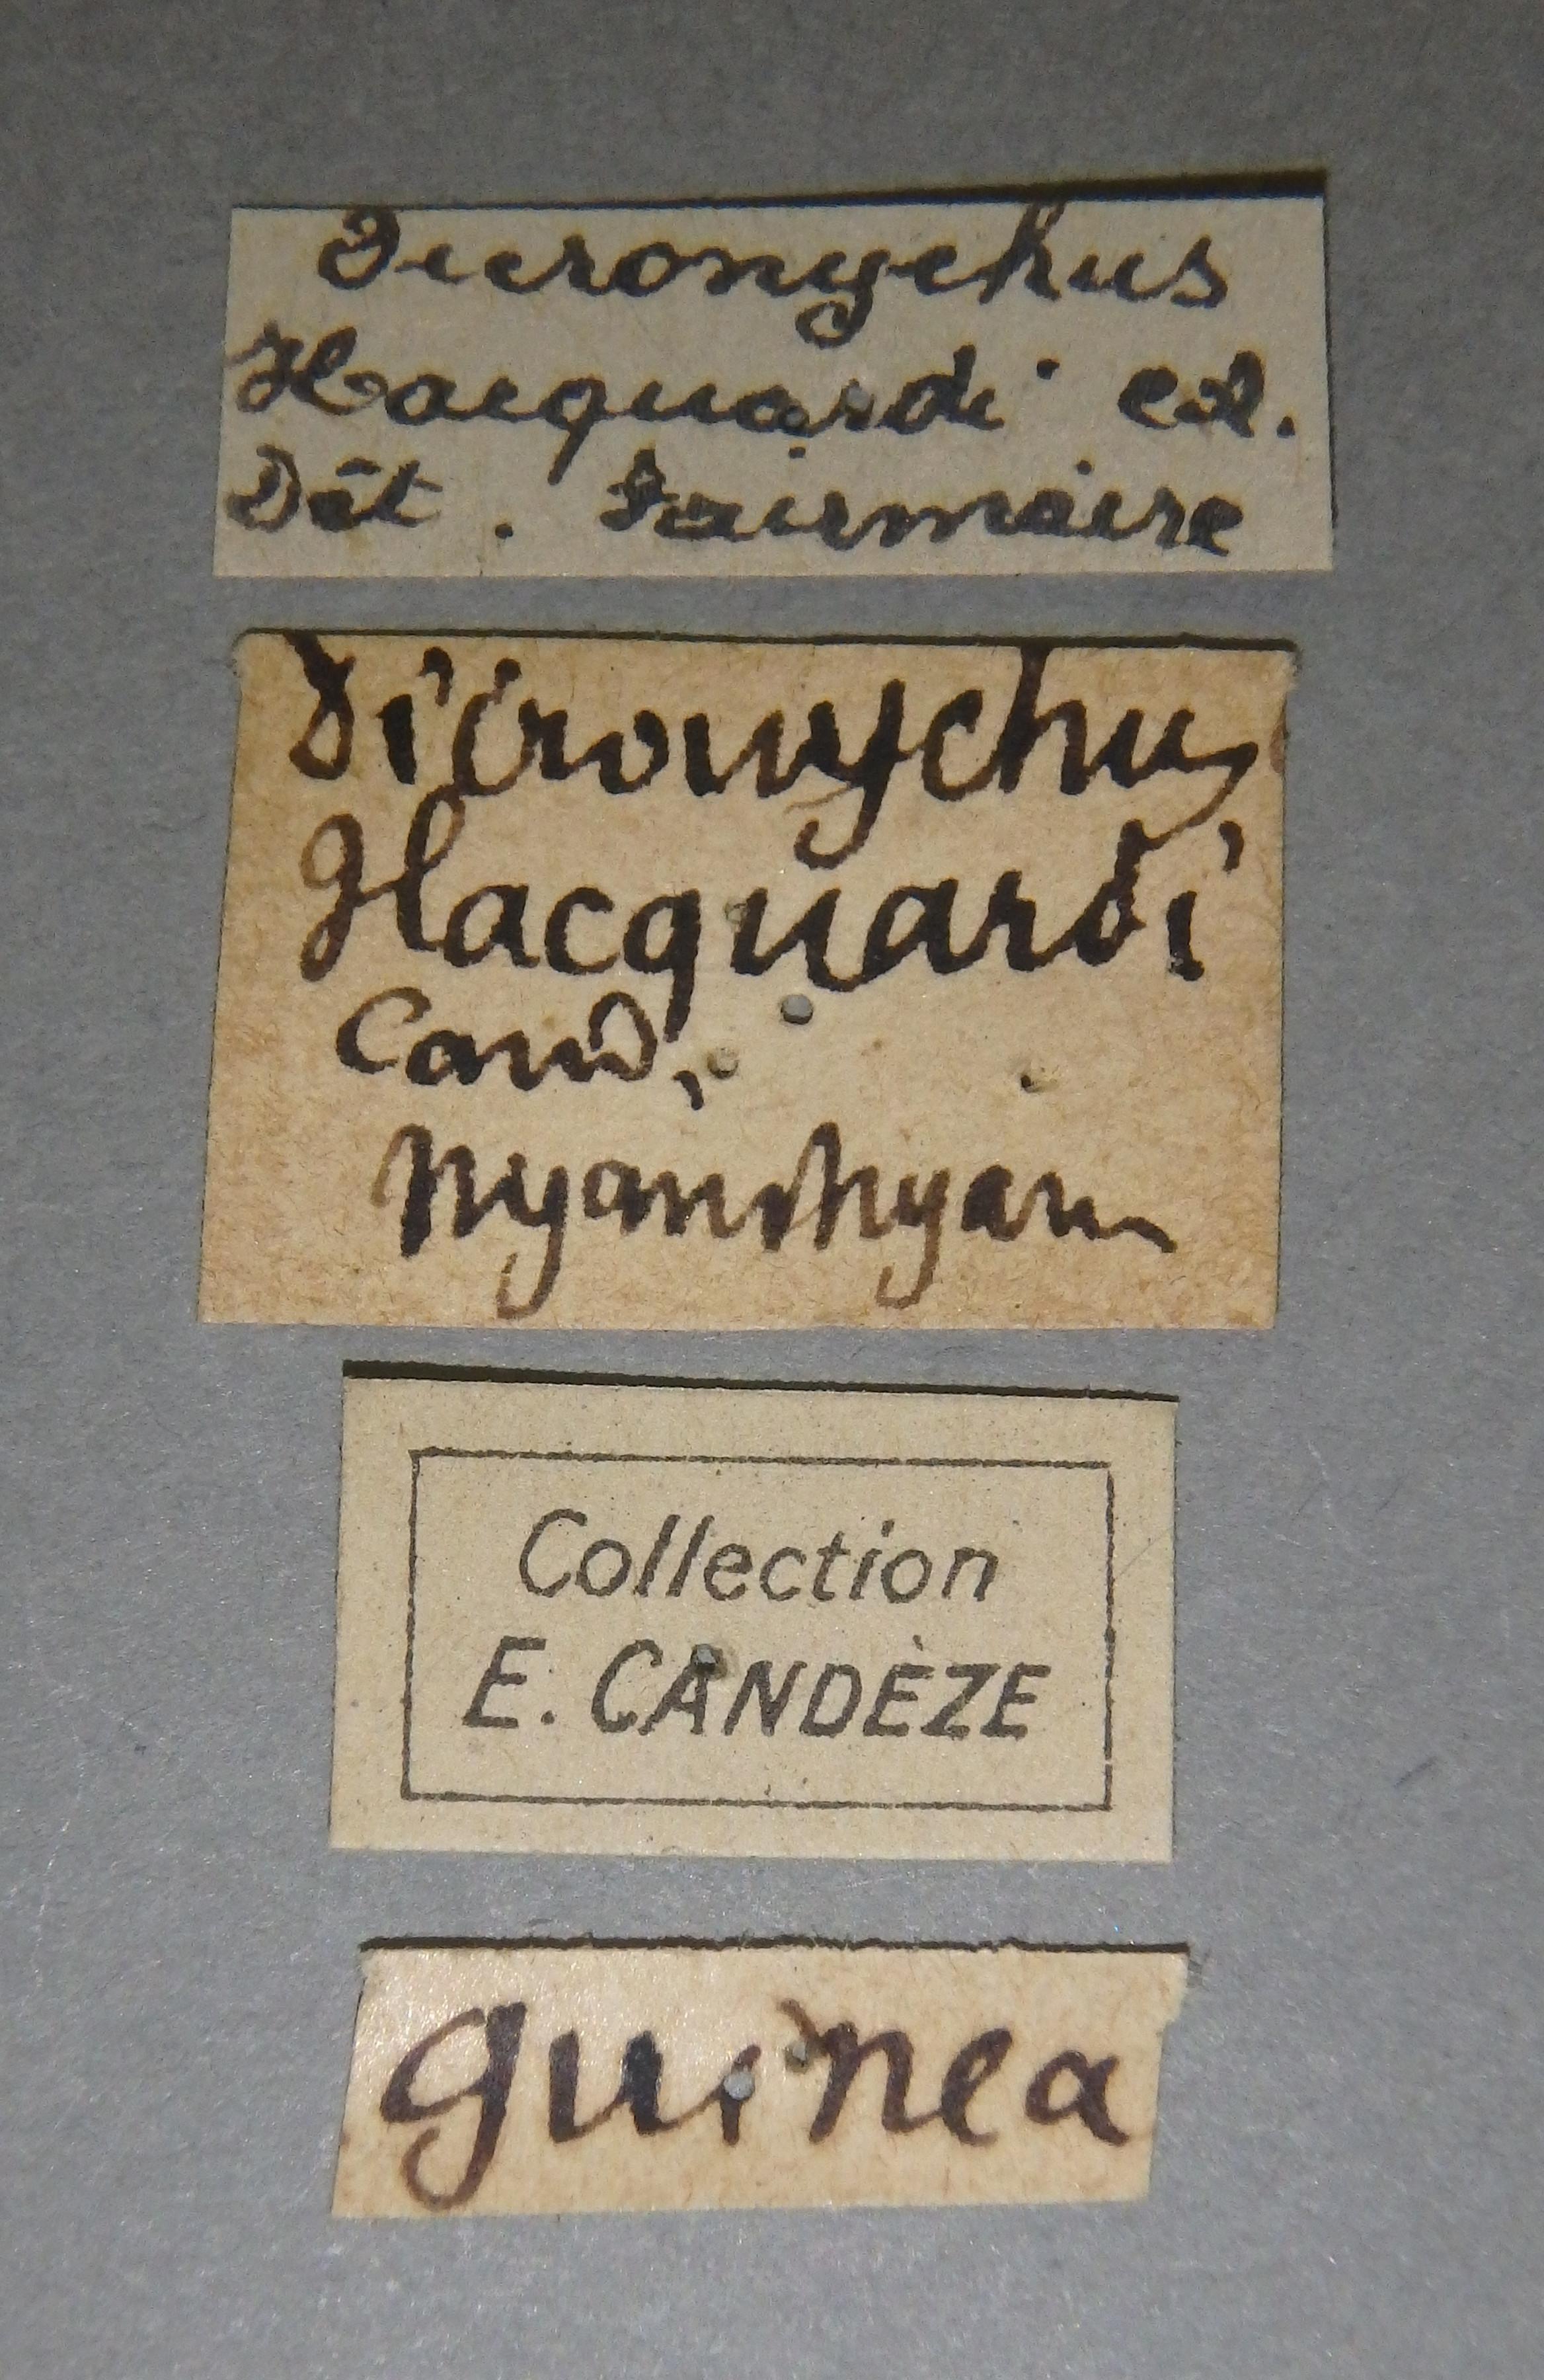 Dicronychus hacquardi nt5 D Lb.JPG